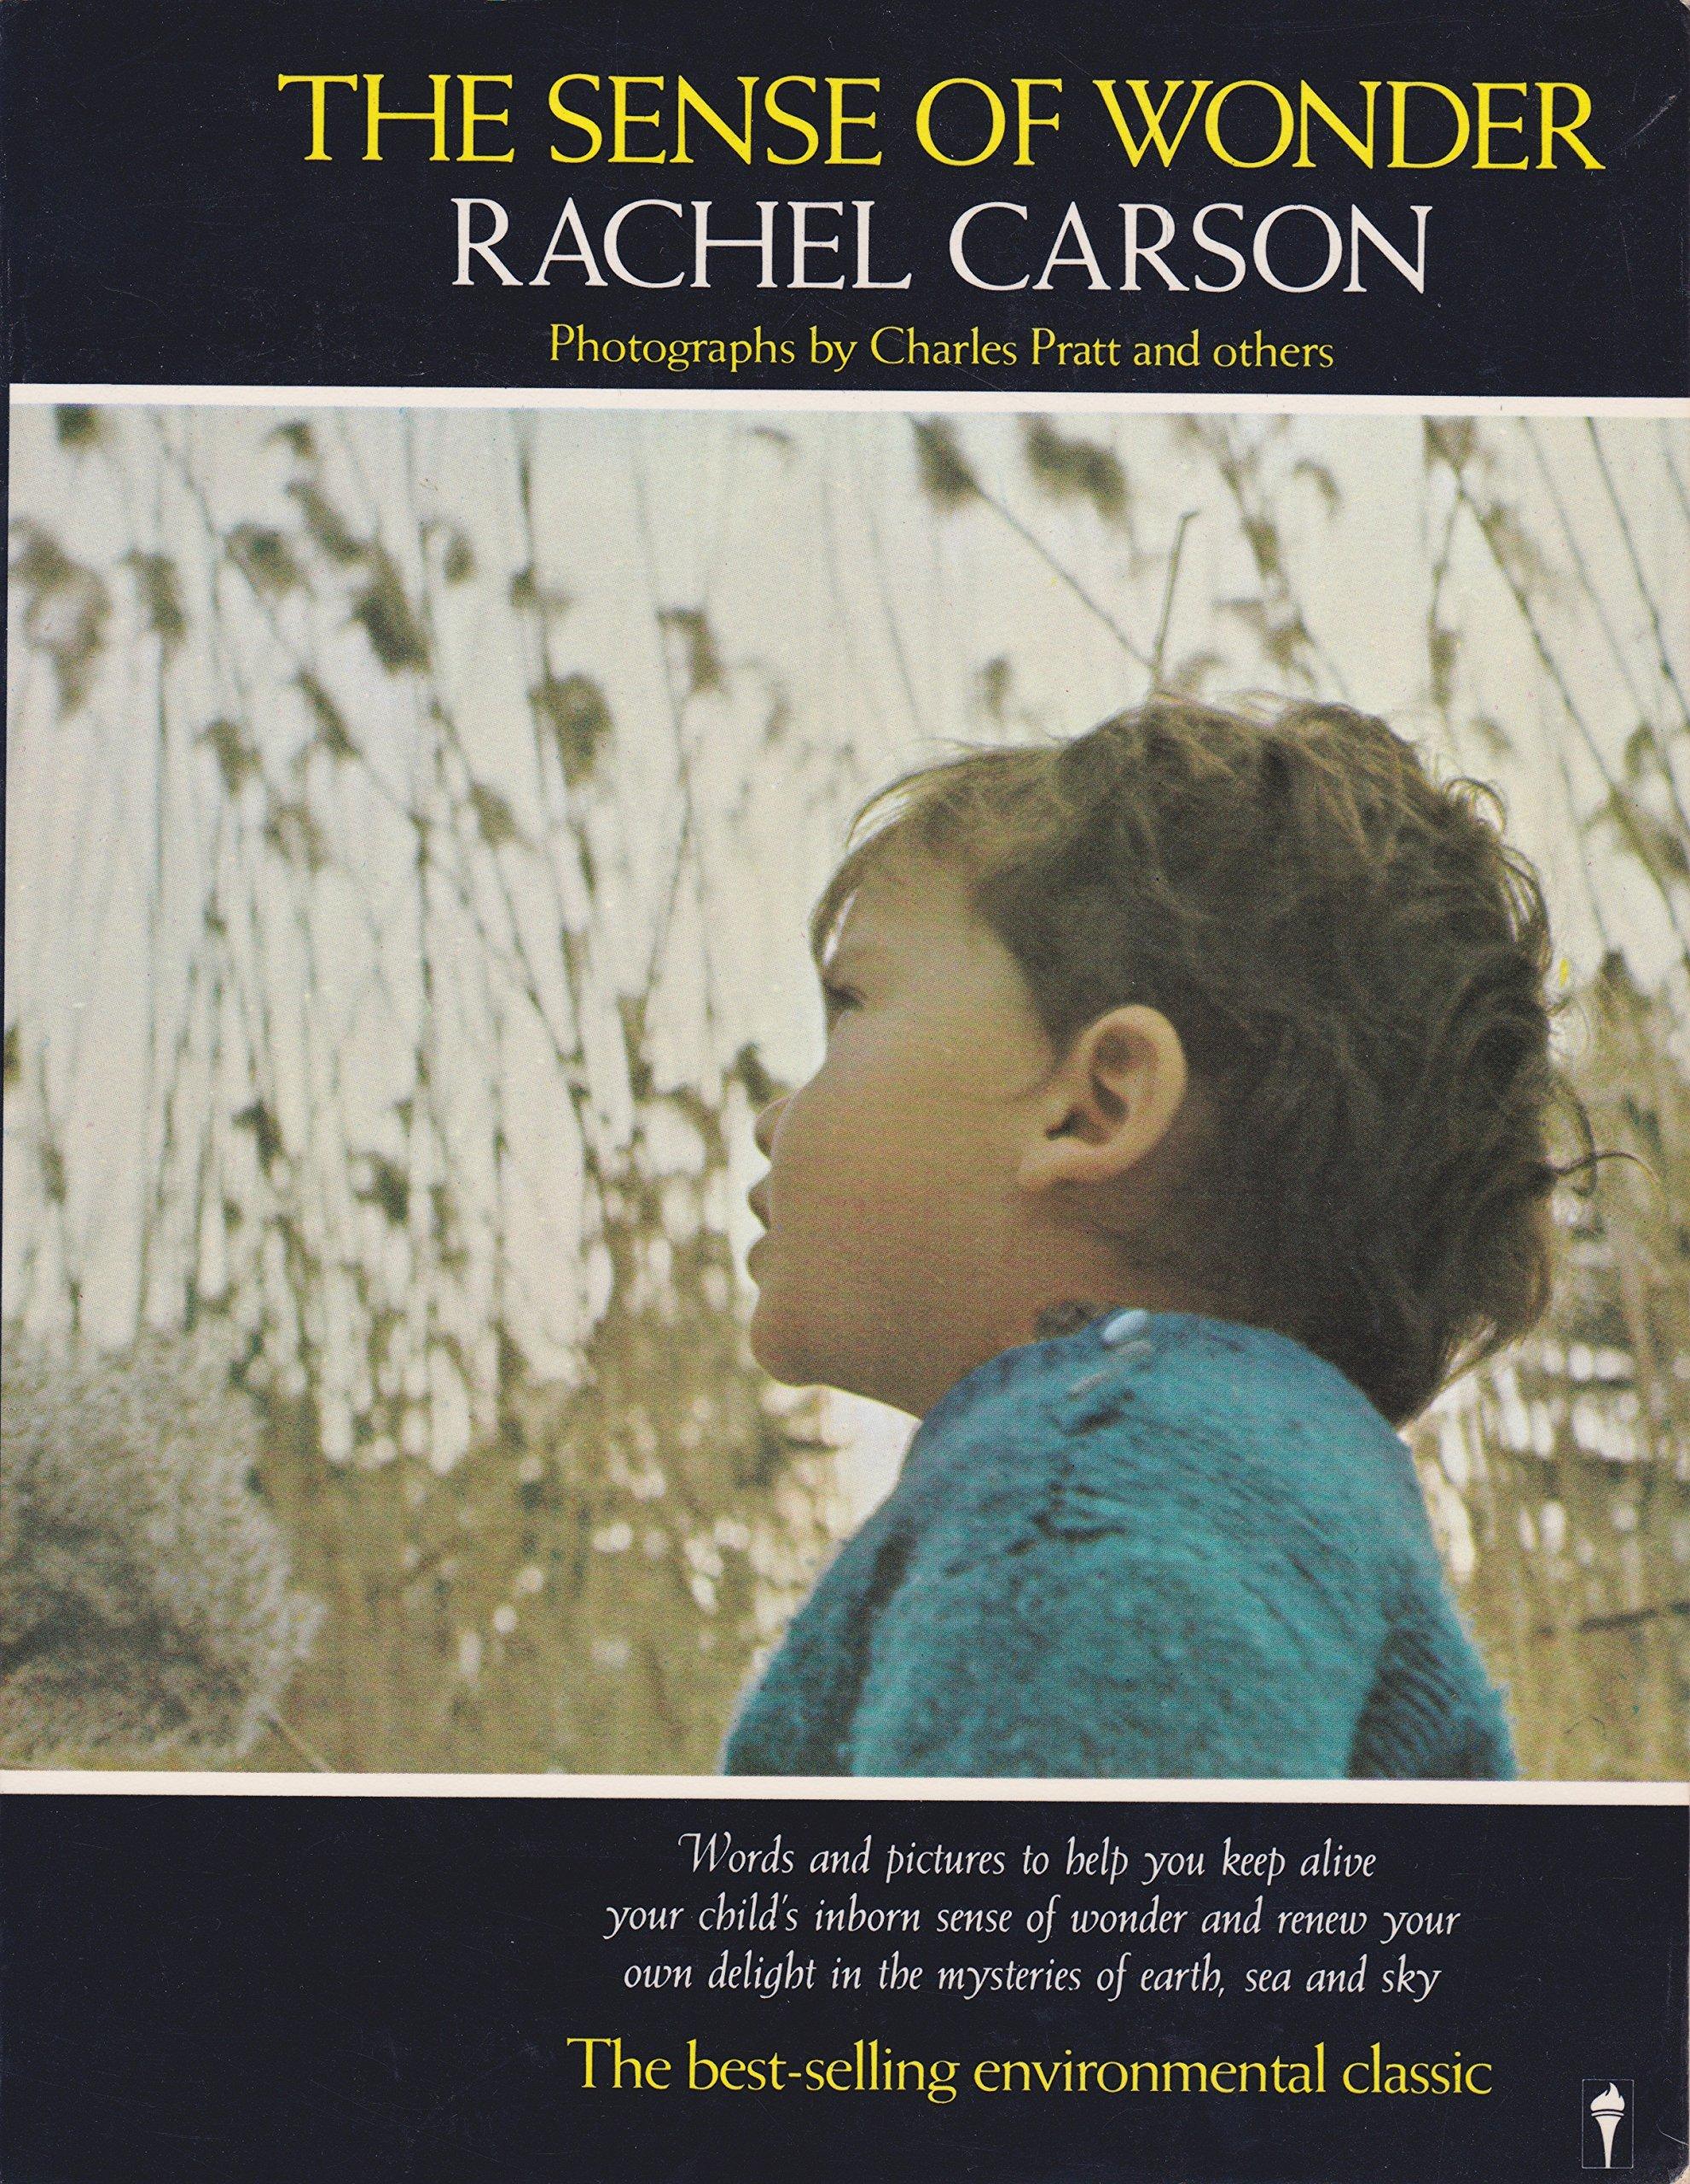 a754fbf1129 The Sense of Wonder: Rachel Carson, Charles Pratt: 9780060914509:  Amazon.com: Books